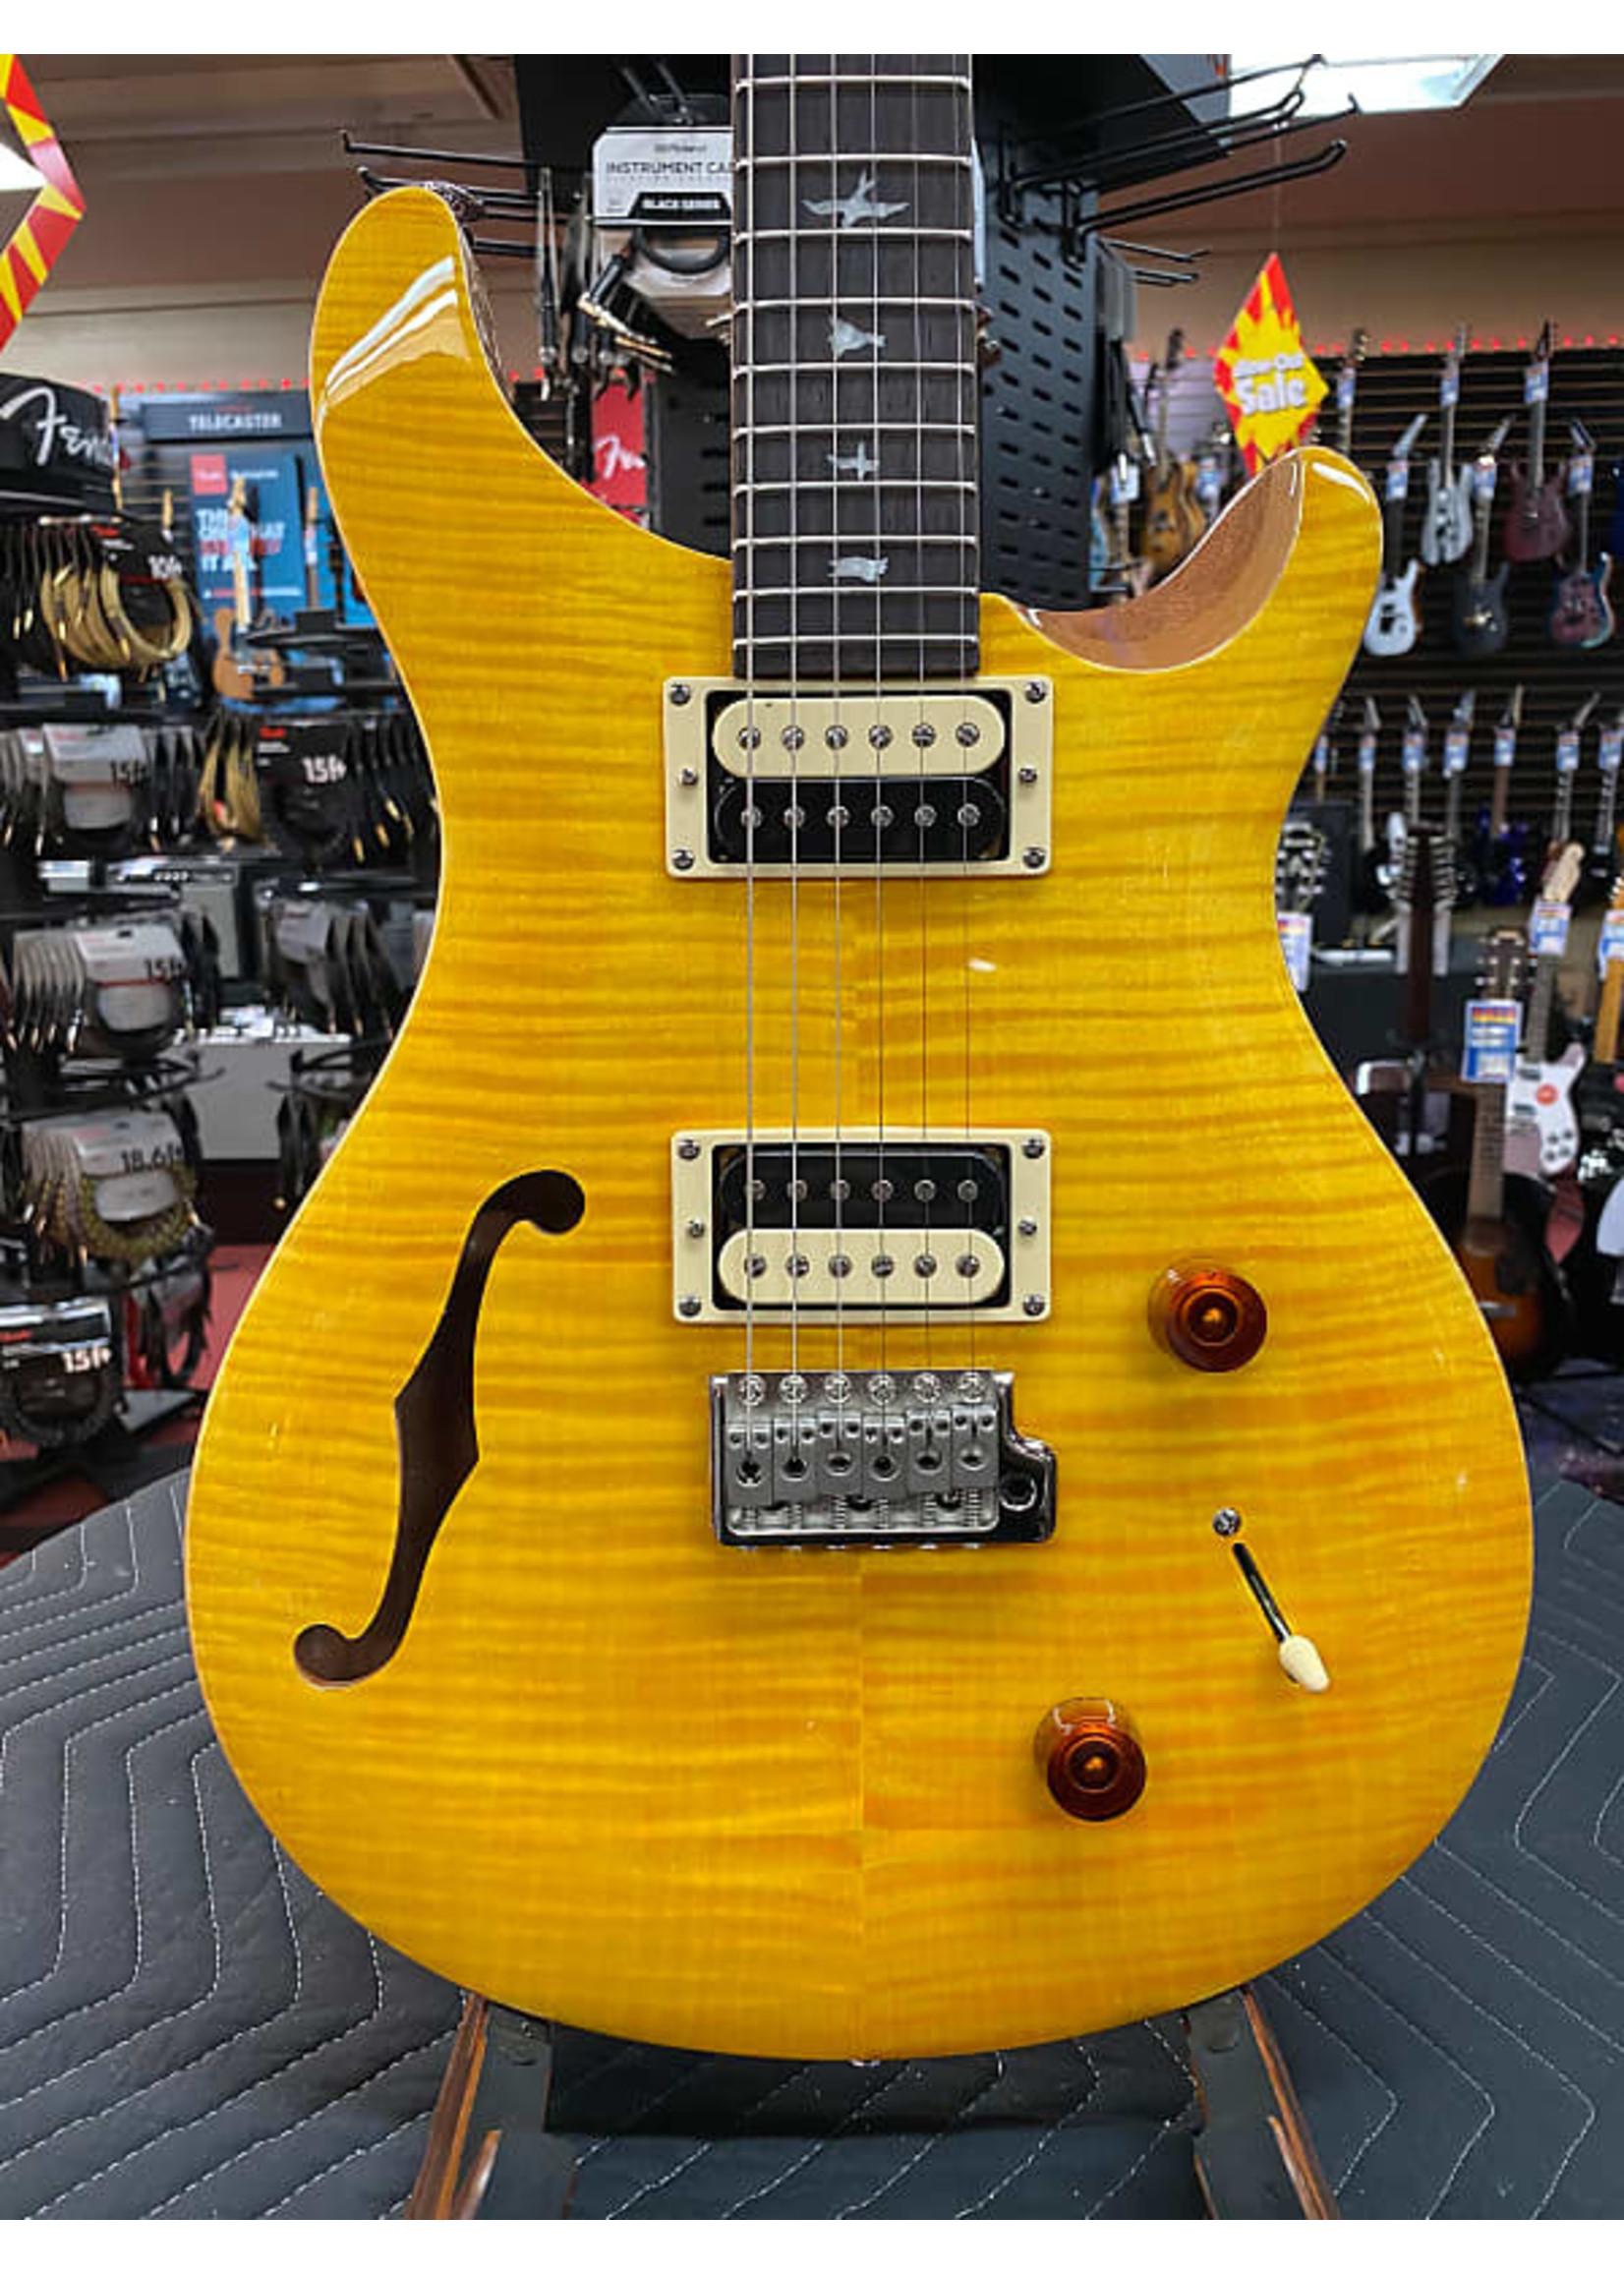 Paul Reed Smith Paul Reed Smith SE Custom 22 Semi-hollow Electric Guitar - Santana Yellow